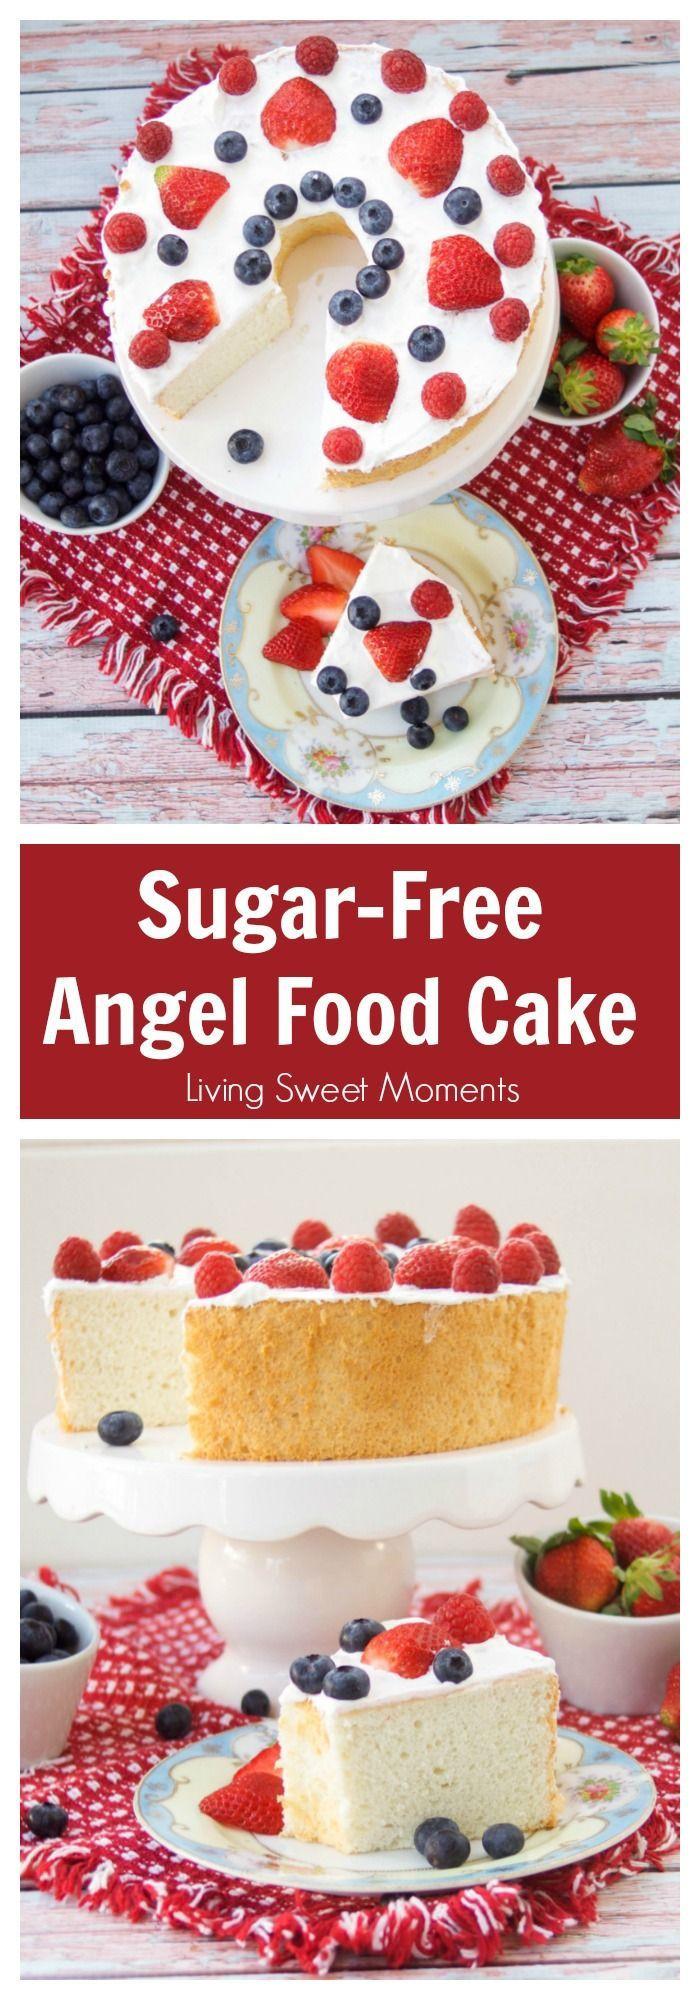 Sugar Free Dessert Recipes For Diabetics  Best 25 Easy diabetic desserts ideas on Pinterest